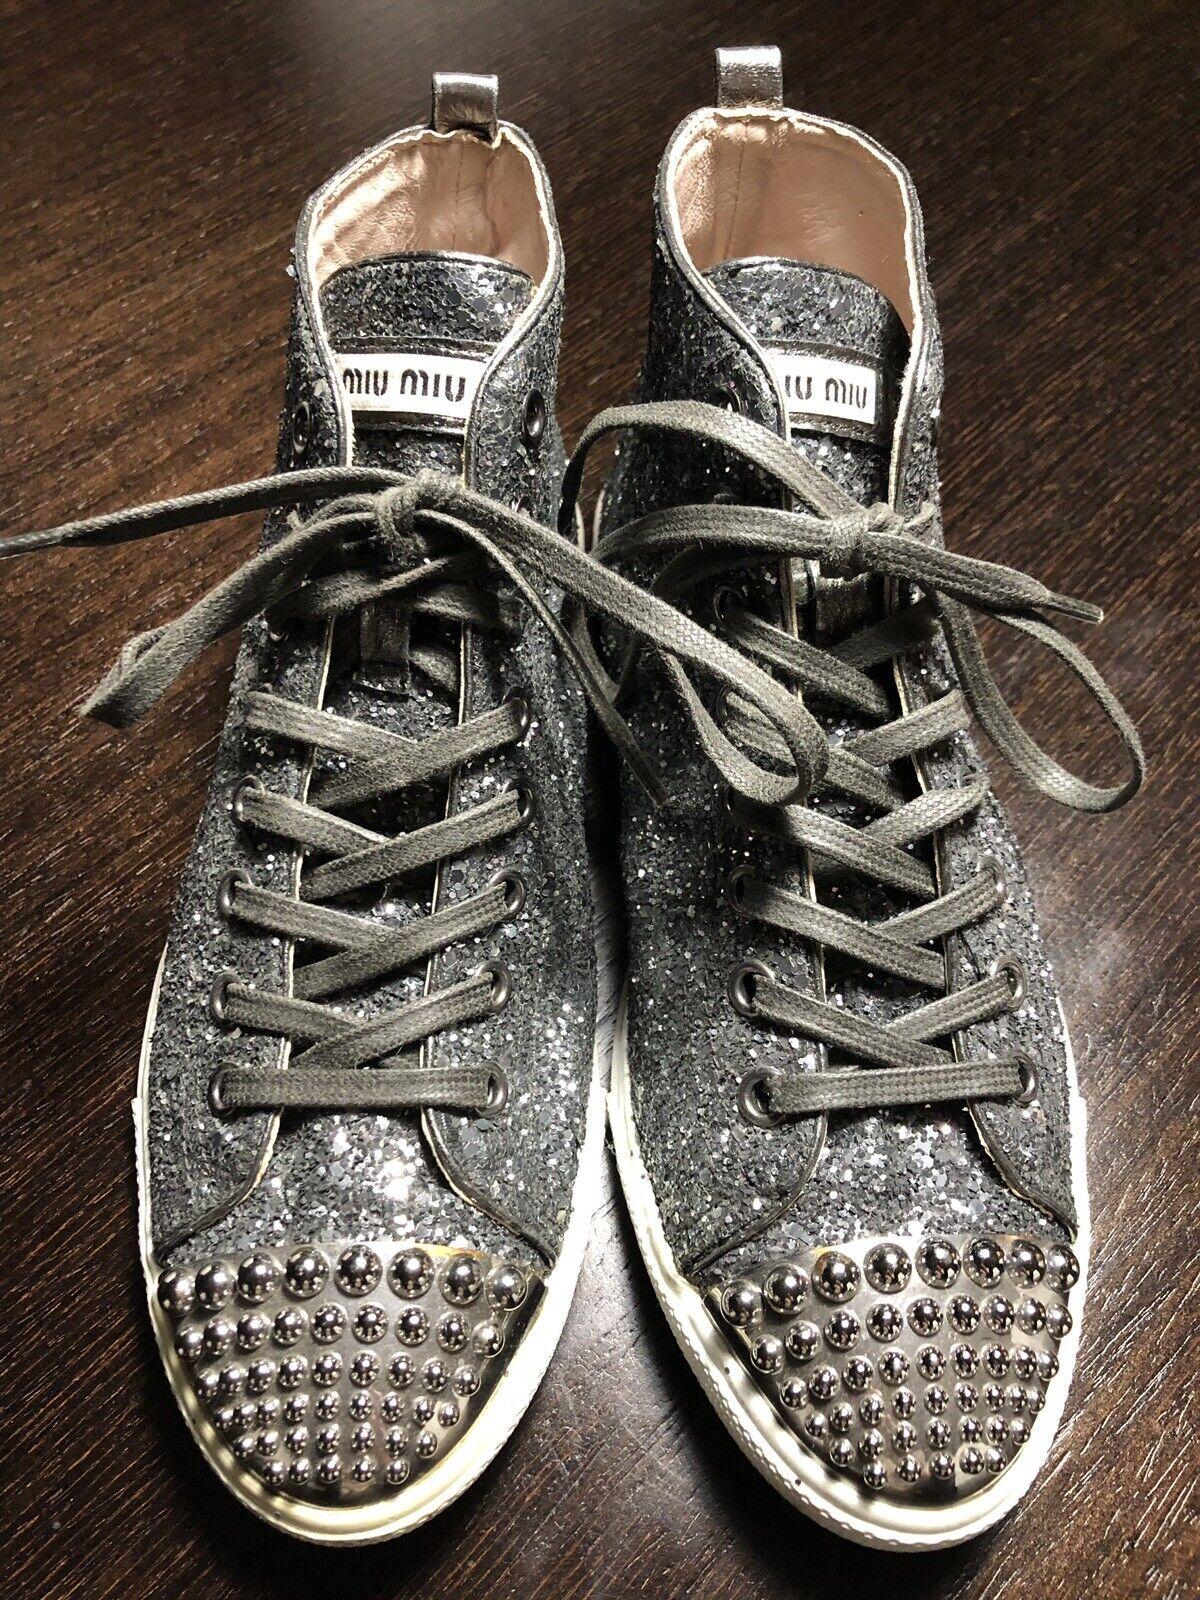 PRADA MIU MIU argent Glitter Rivets High Top Trainers baskets chaussures 38 UK 5